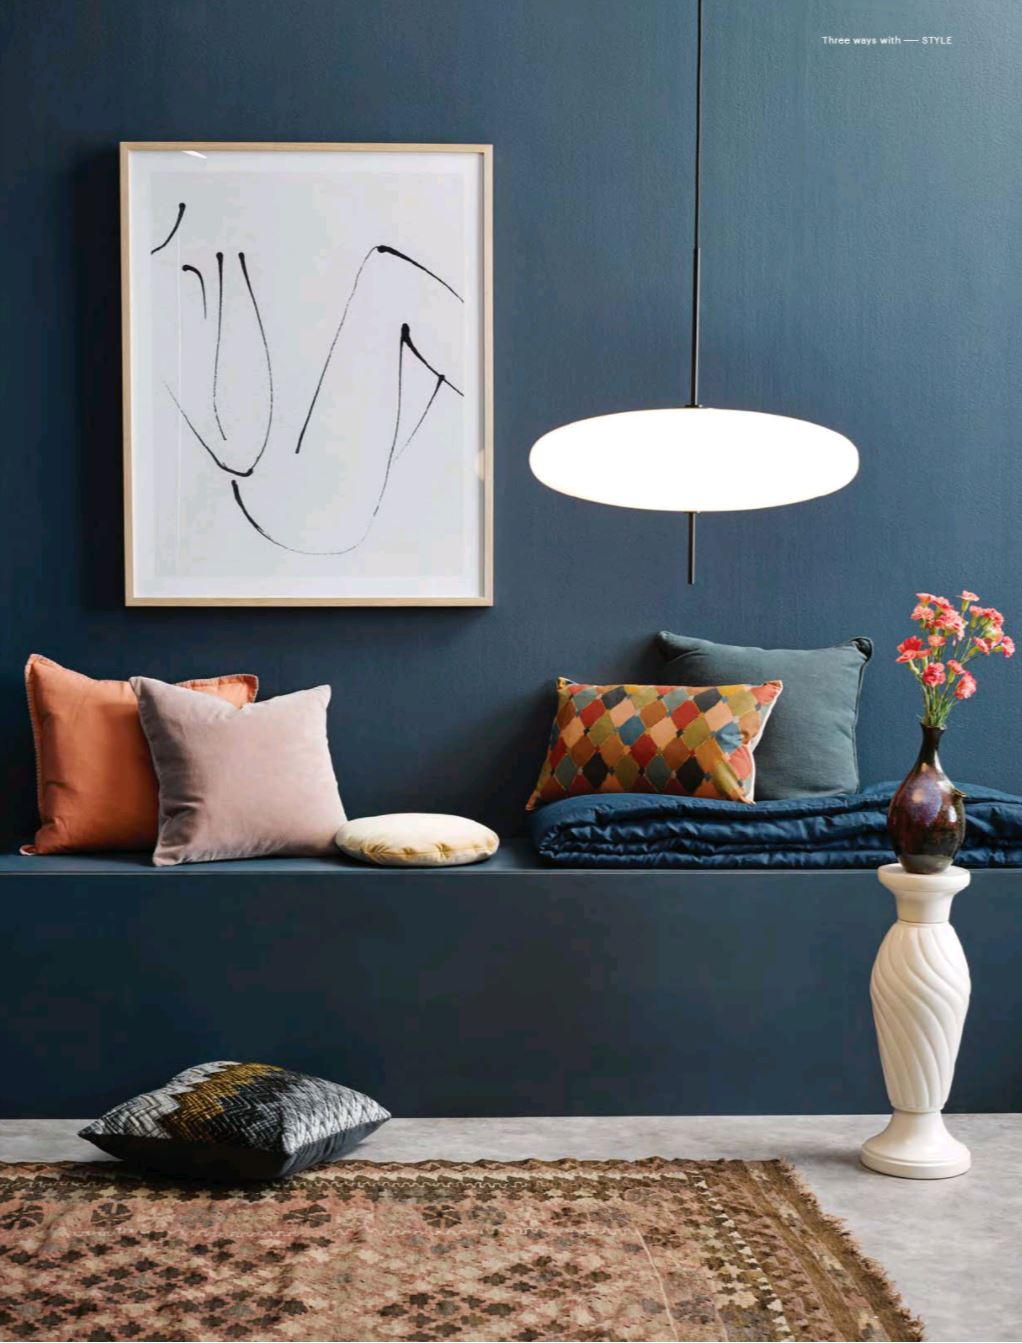 Featured: Astep Model 2065 Pendant Lamp by Gino Sarfatti